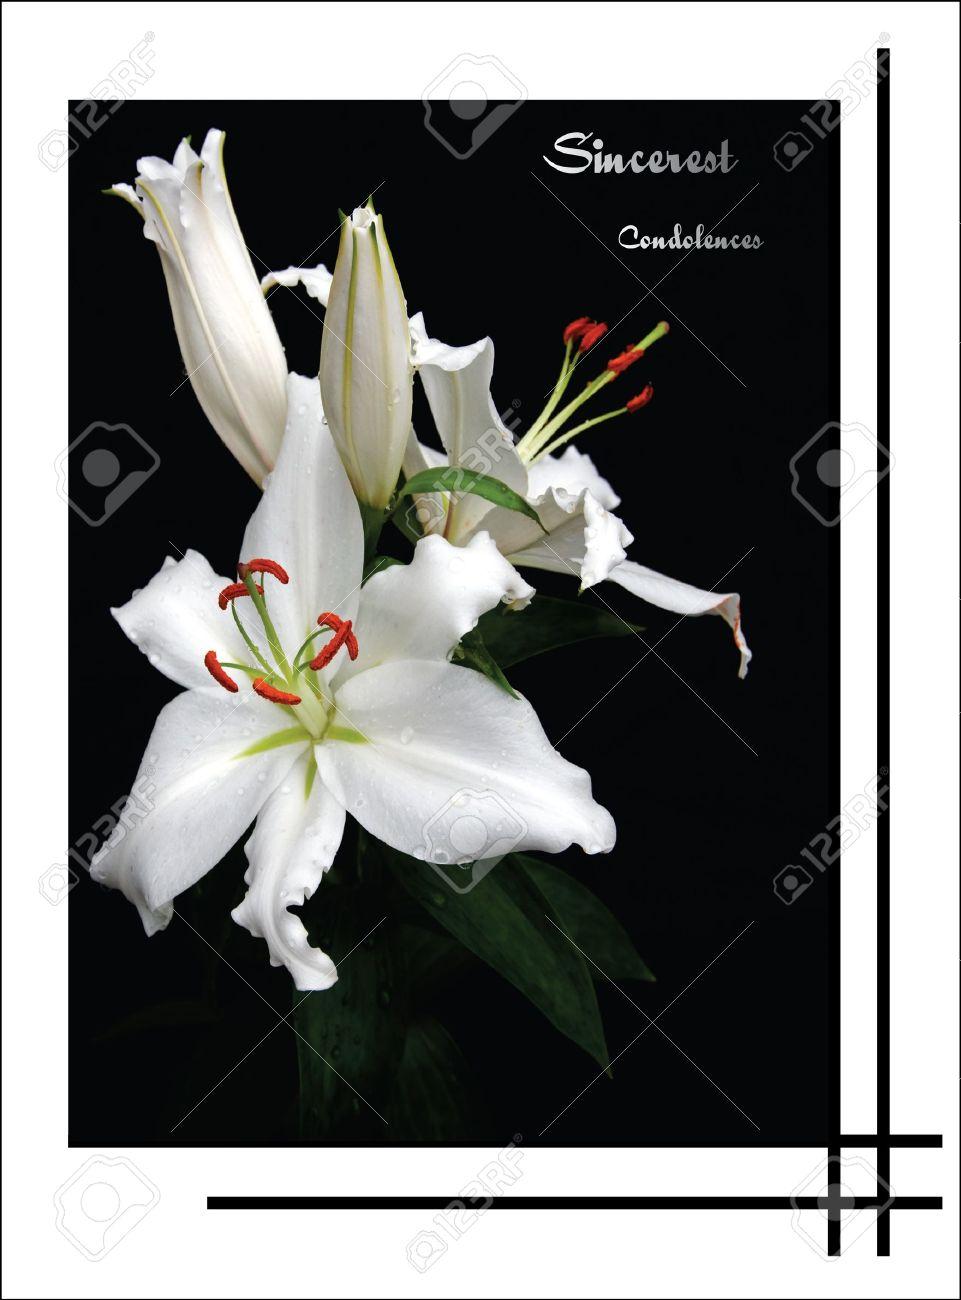 lily condolence card - 15856599